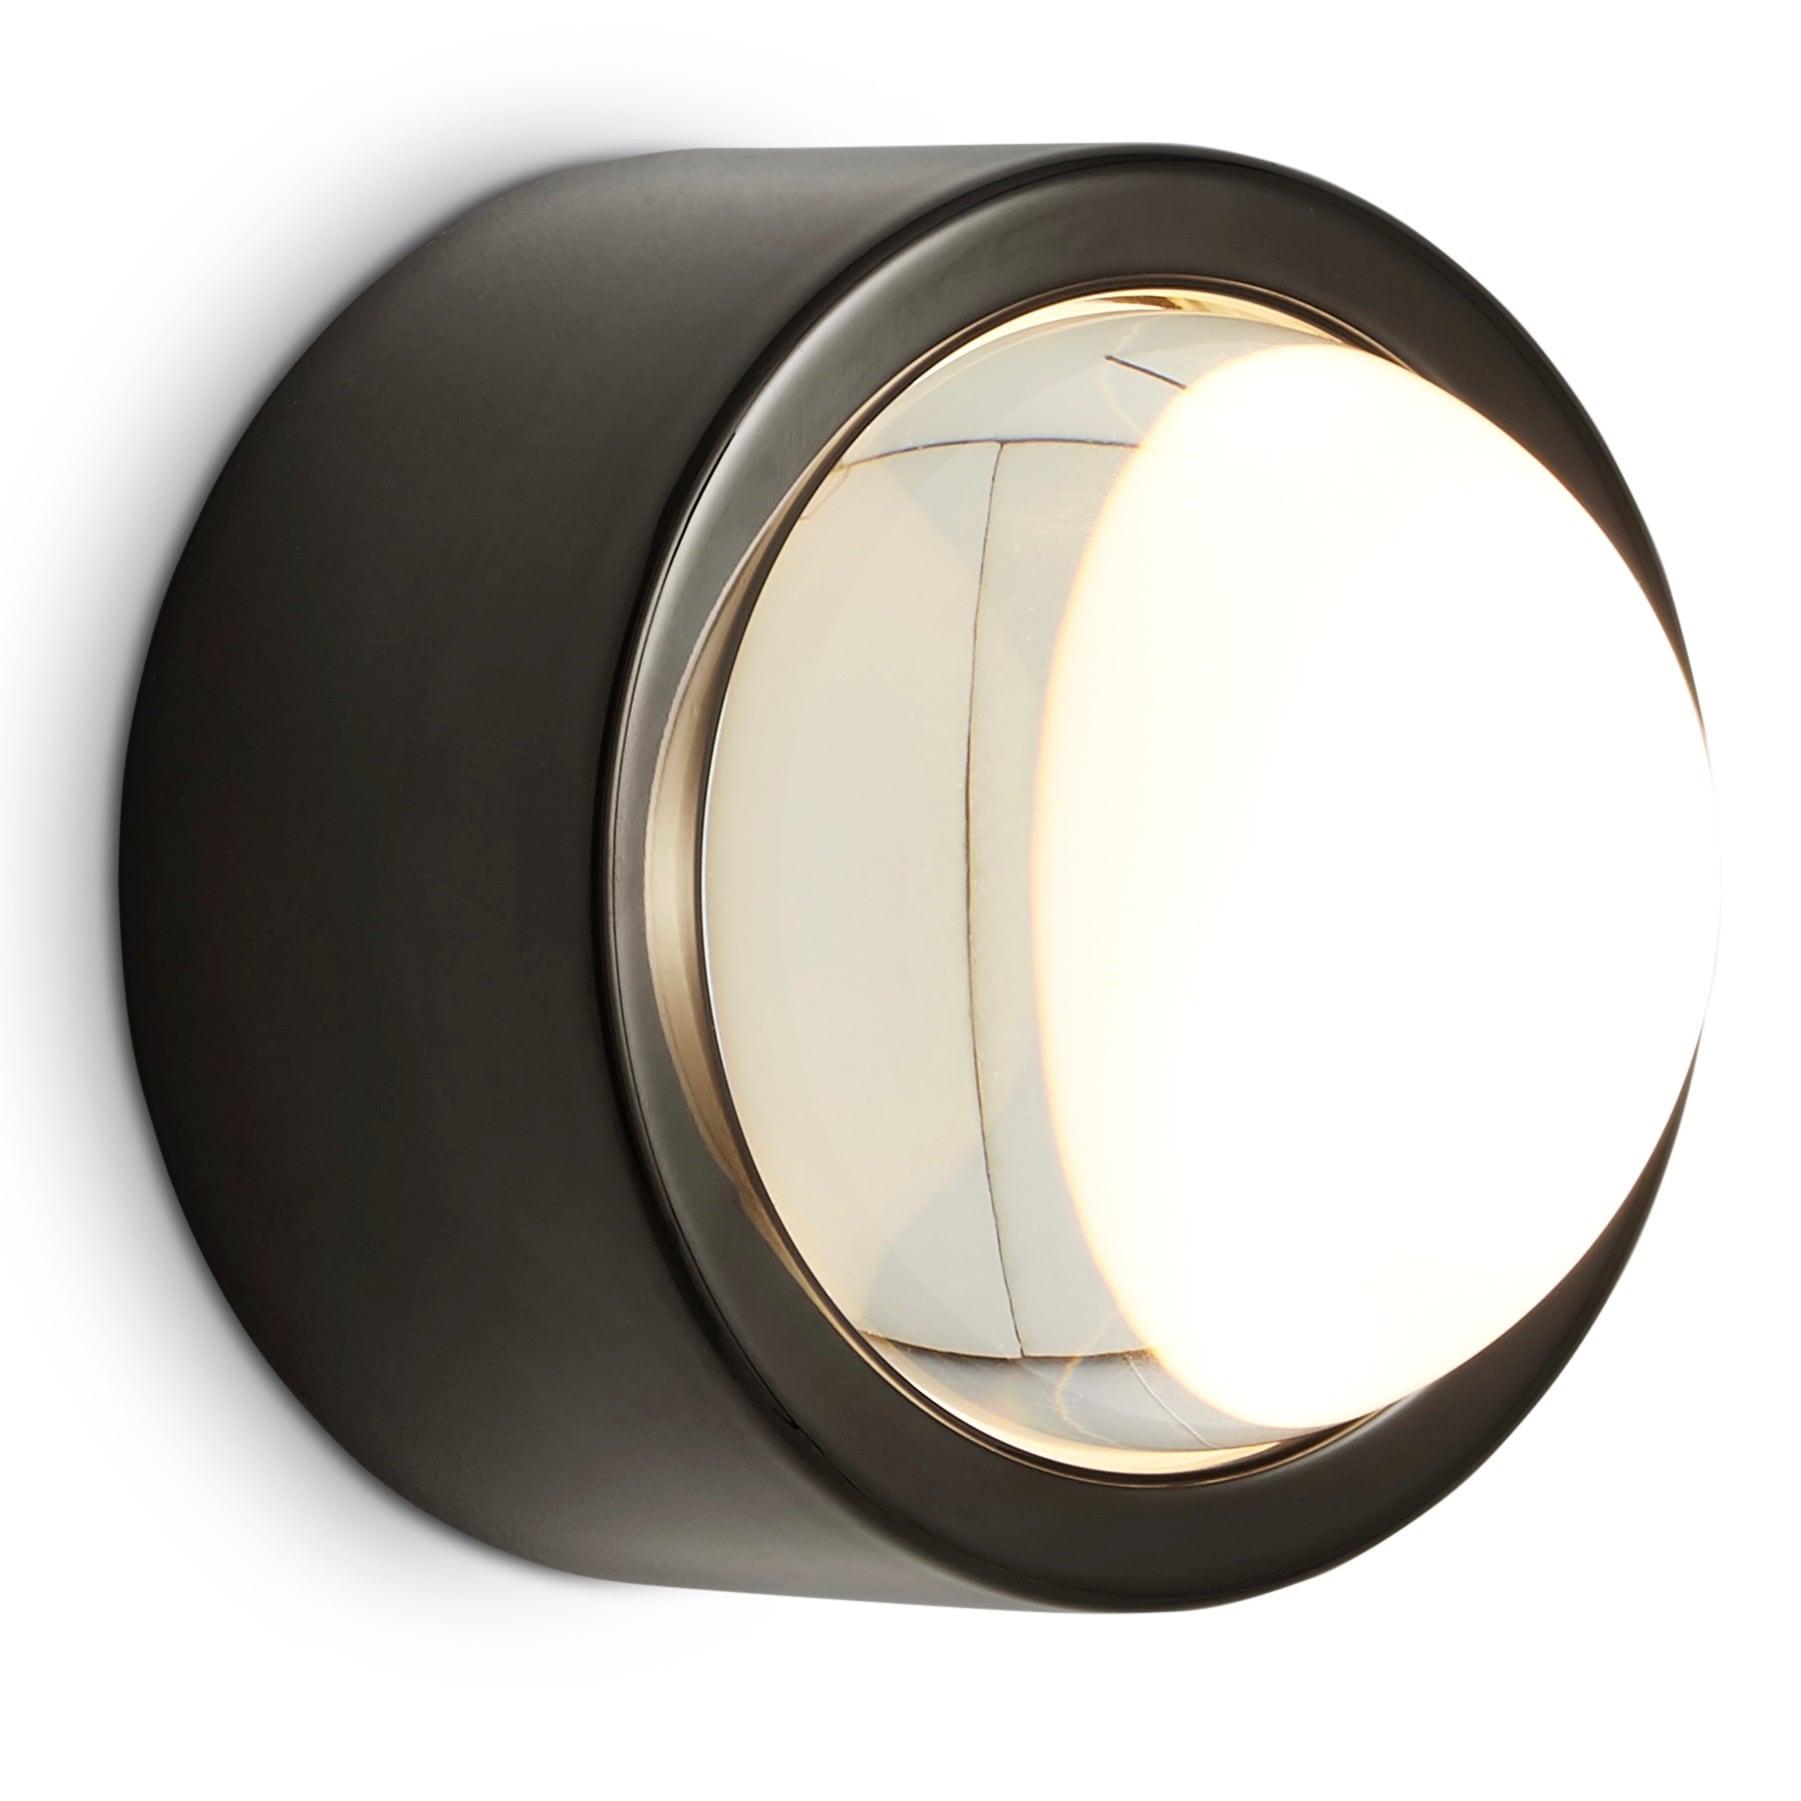 Spot Round vägglampa svart